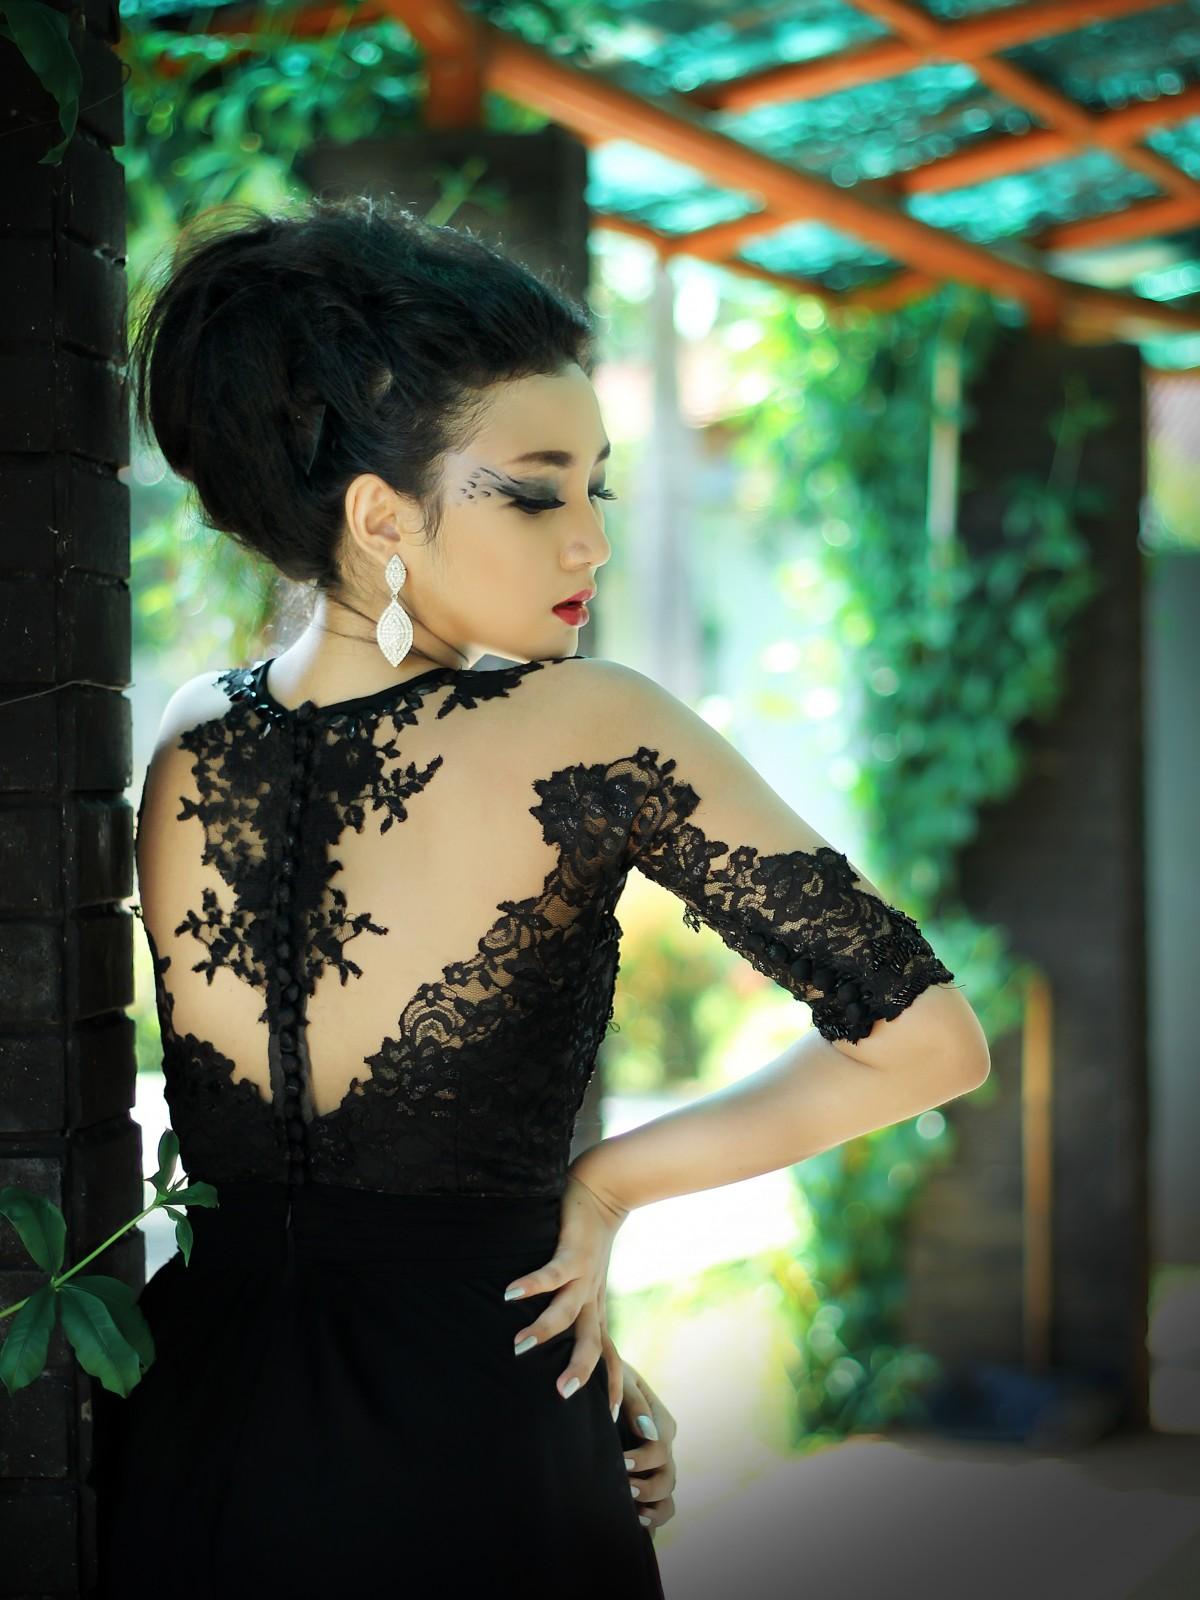 2017 Most Beautiful Girls Wallpaper Free Images Woman Photography Female Pattern Model